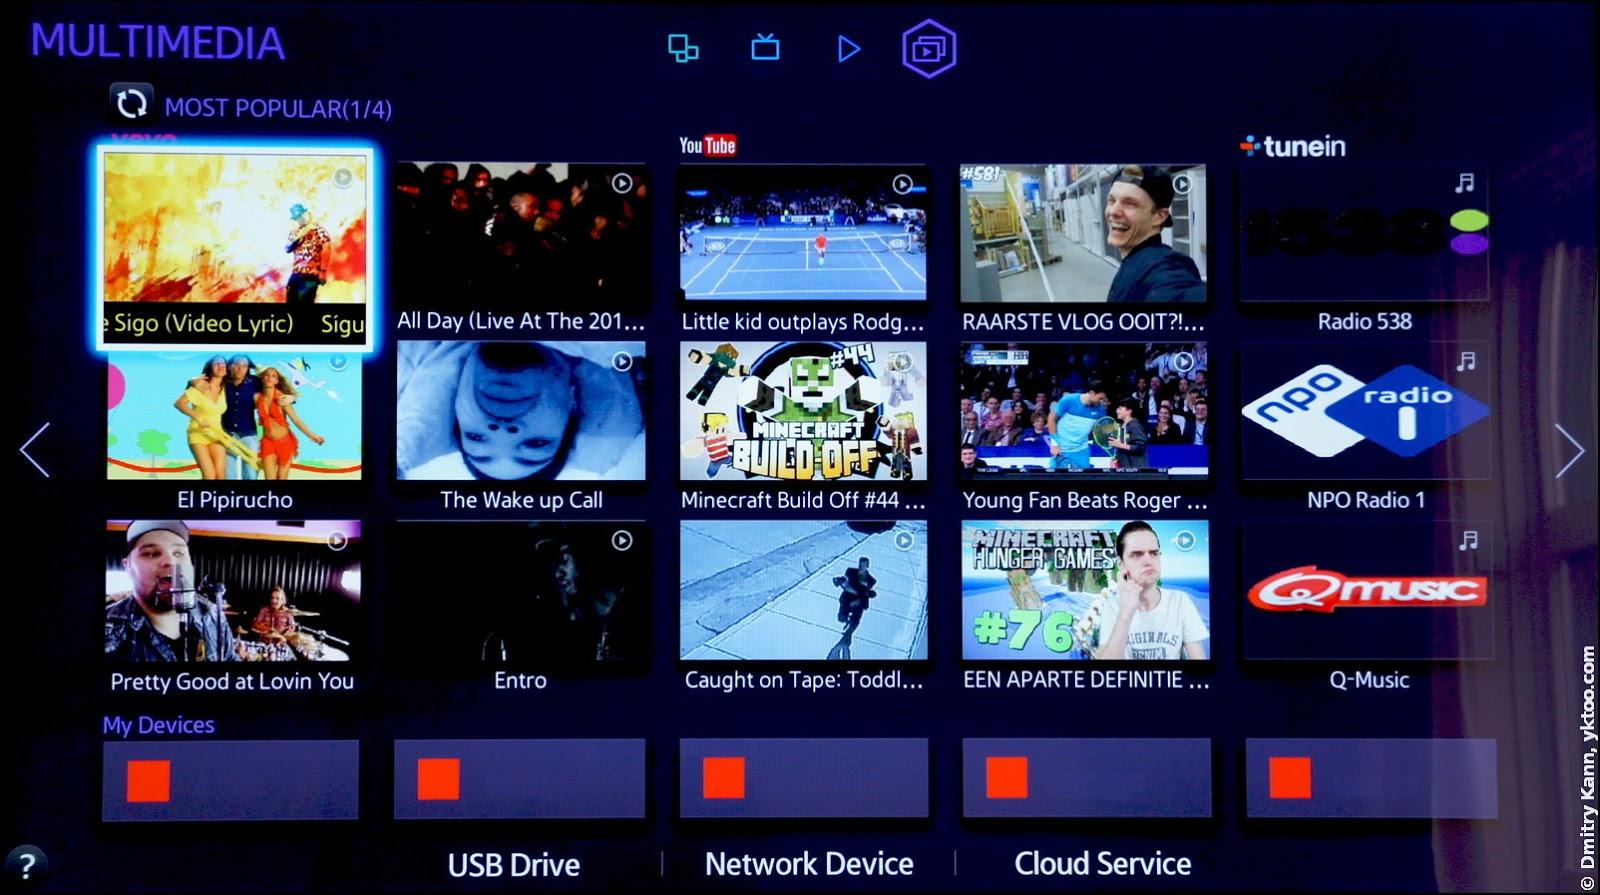 Smart Hub: Multimedia